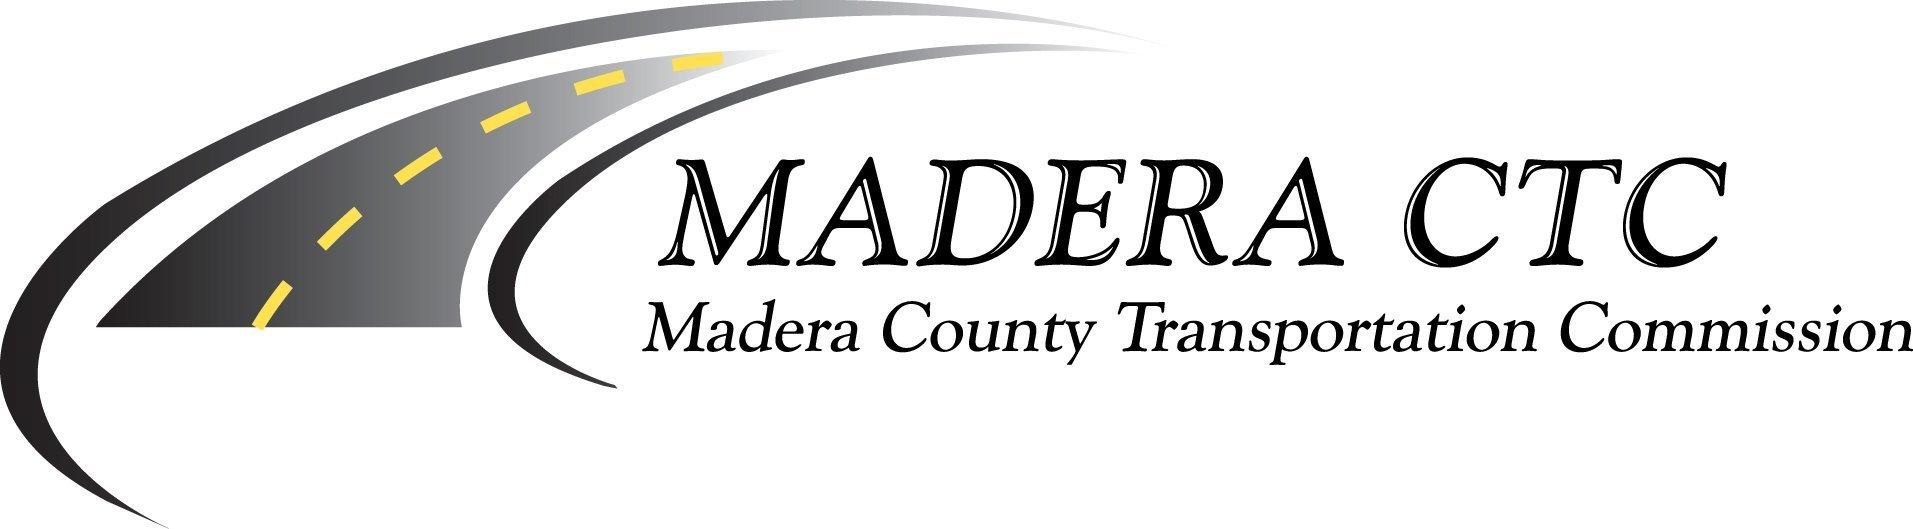 Madera County Transportation Commission (MCTC)